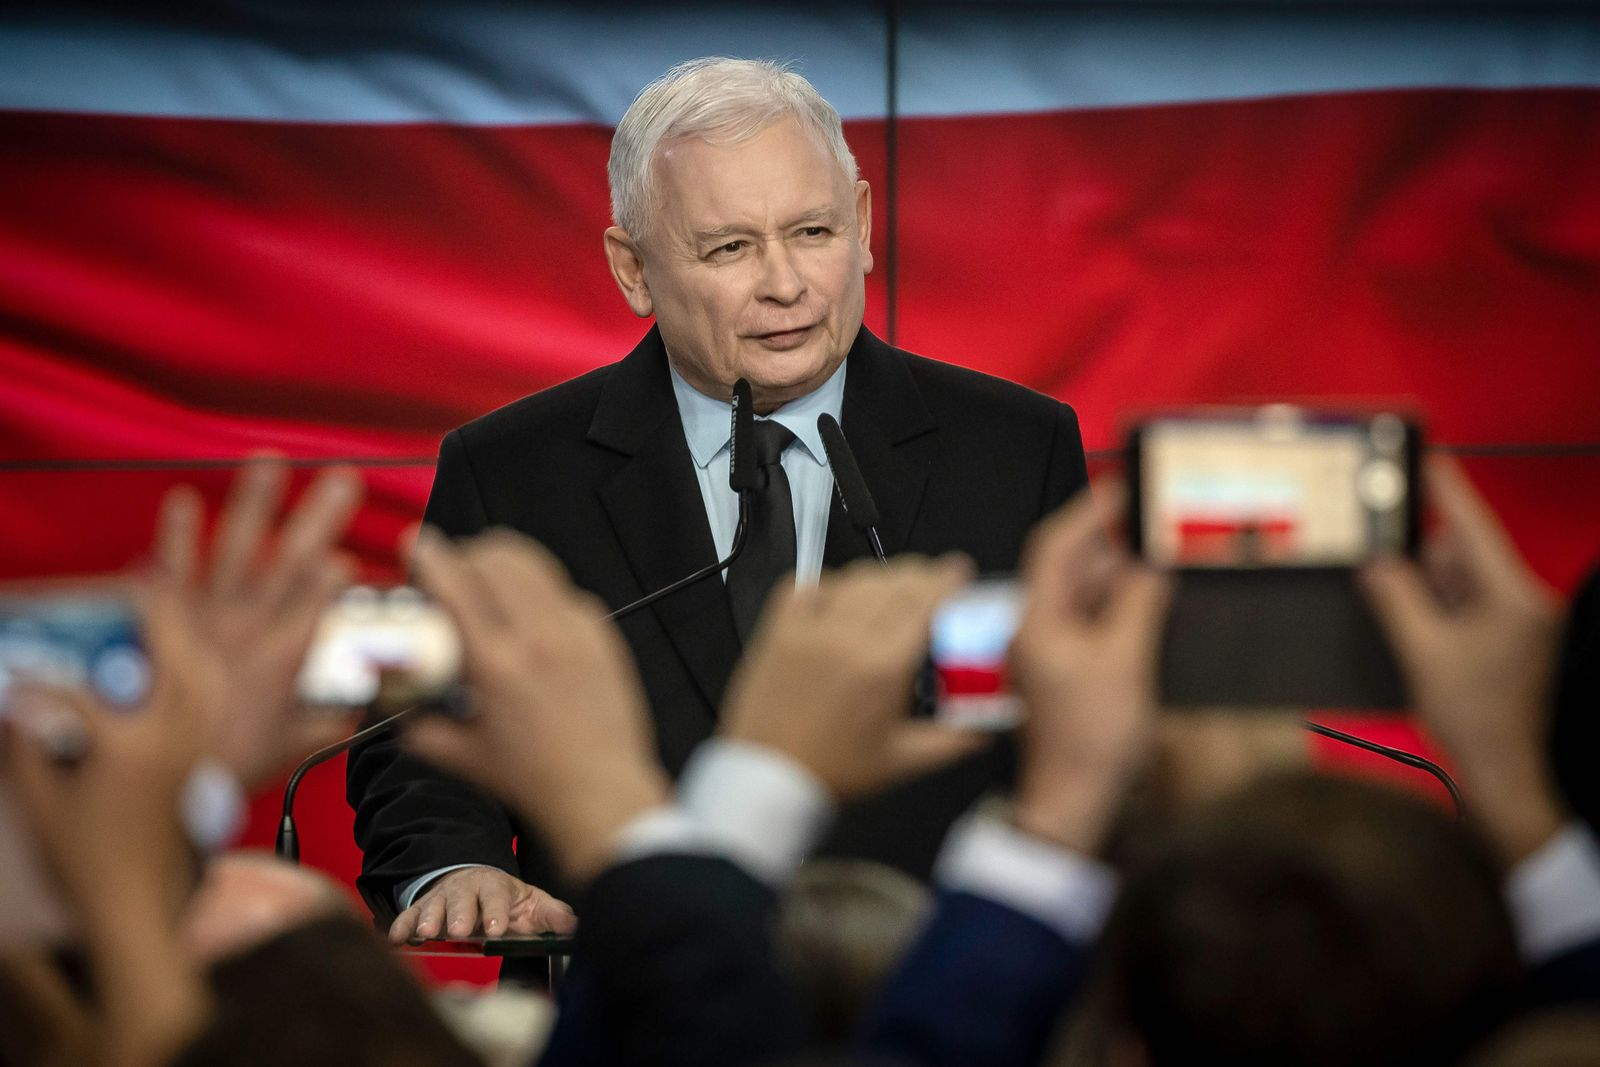 FILES-POLAND-POLITICS-GOVERNMENT-KACZYNSKI